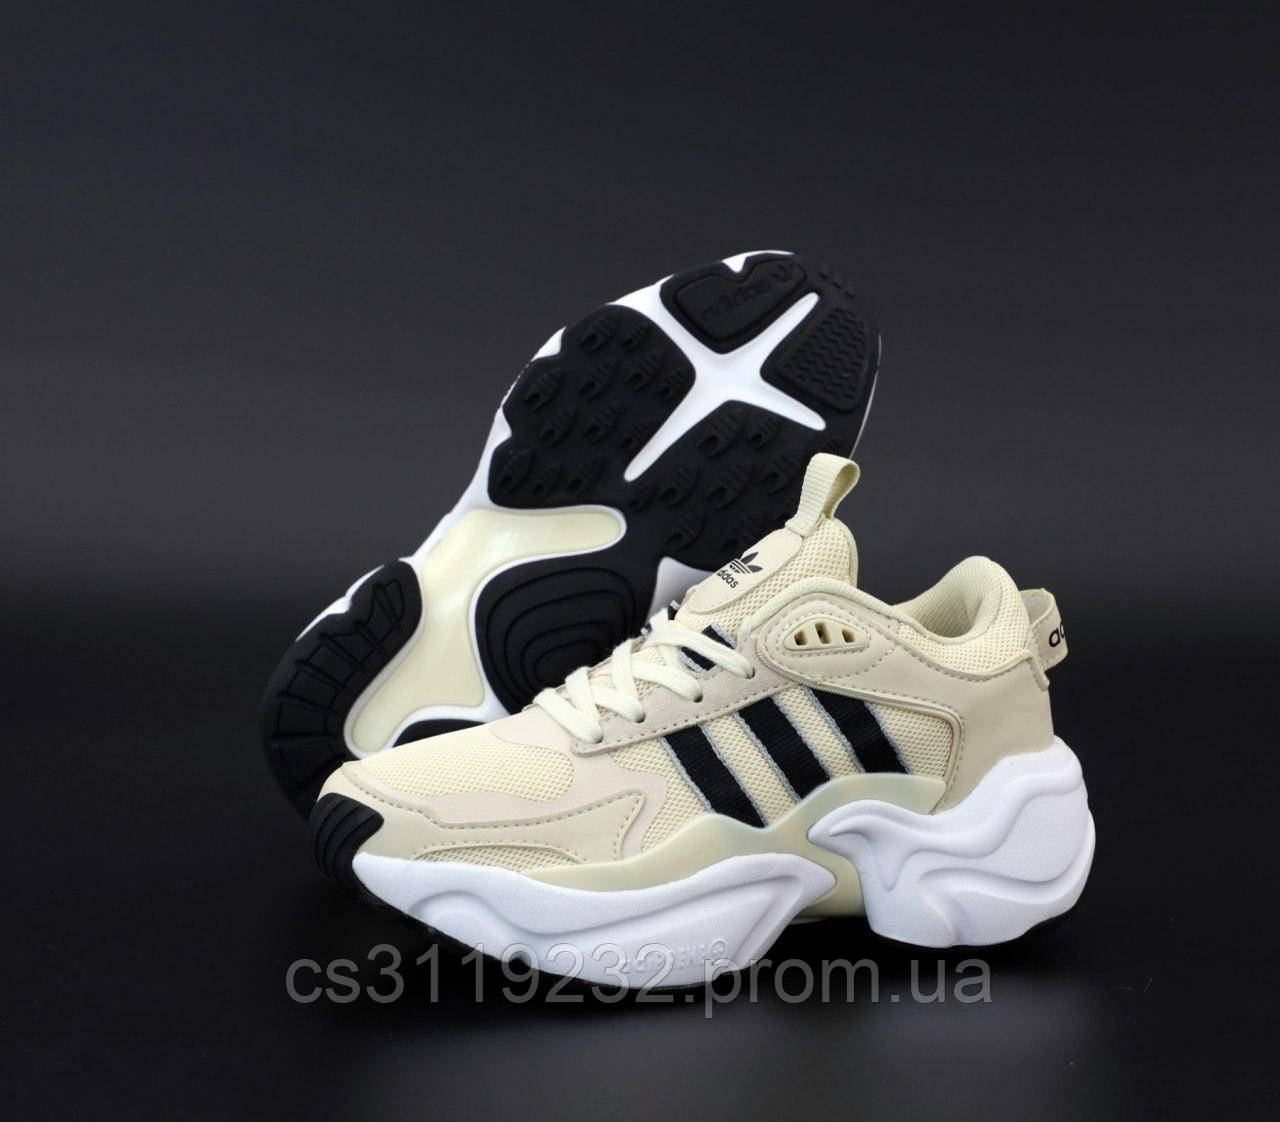 Женские кроссовки Adidas Consortium x Naked Magmur Runner (бежевые)